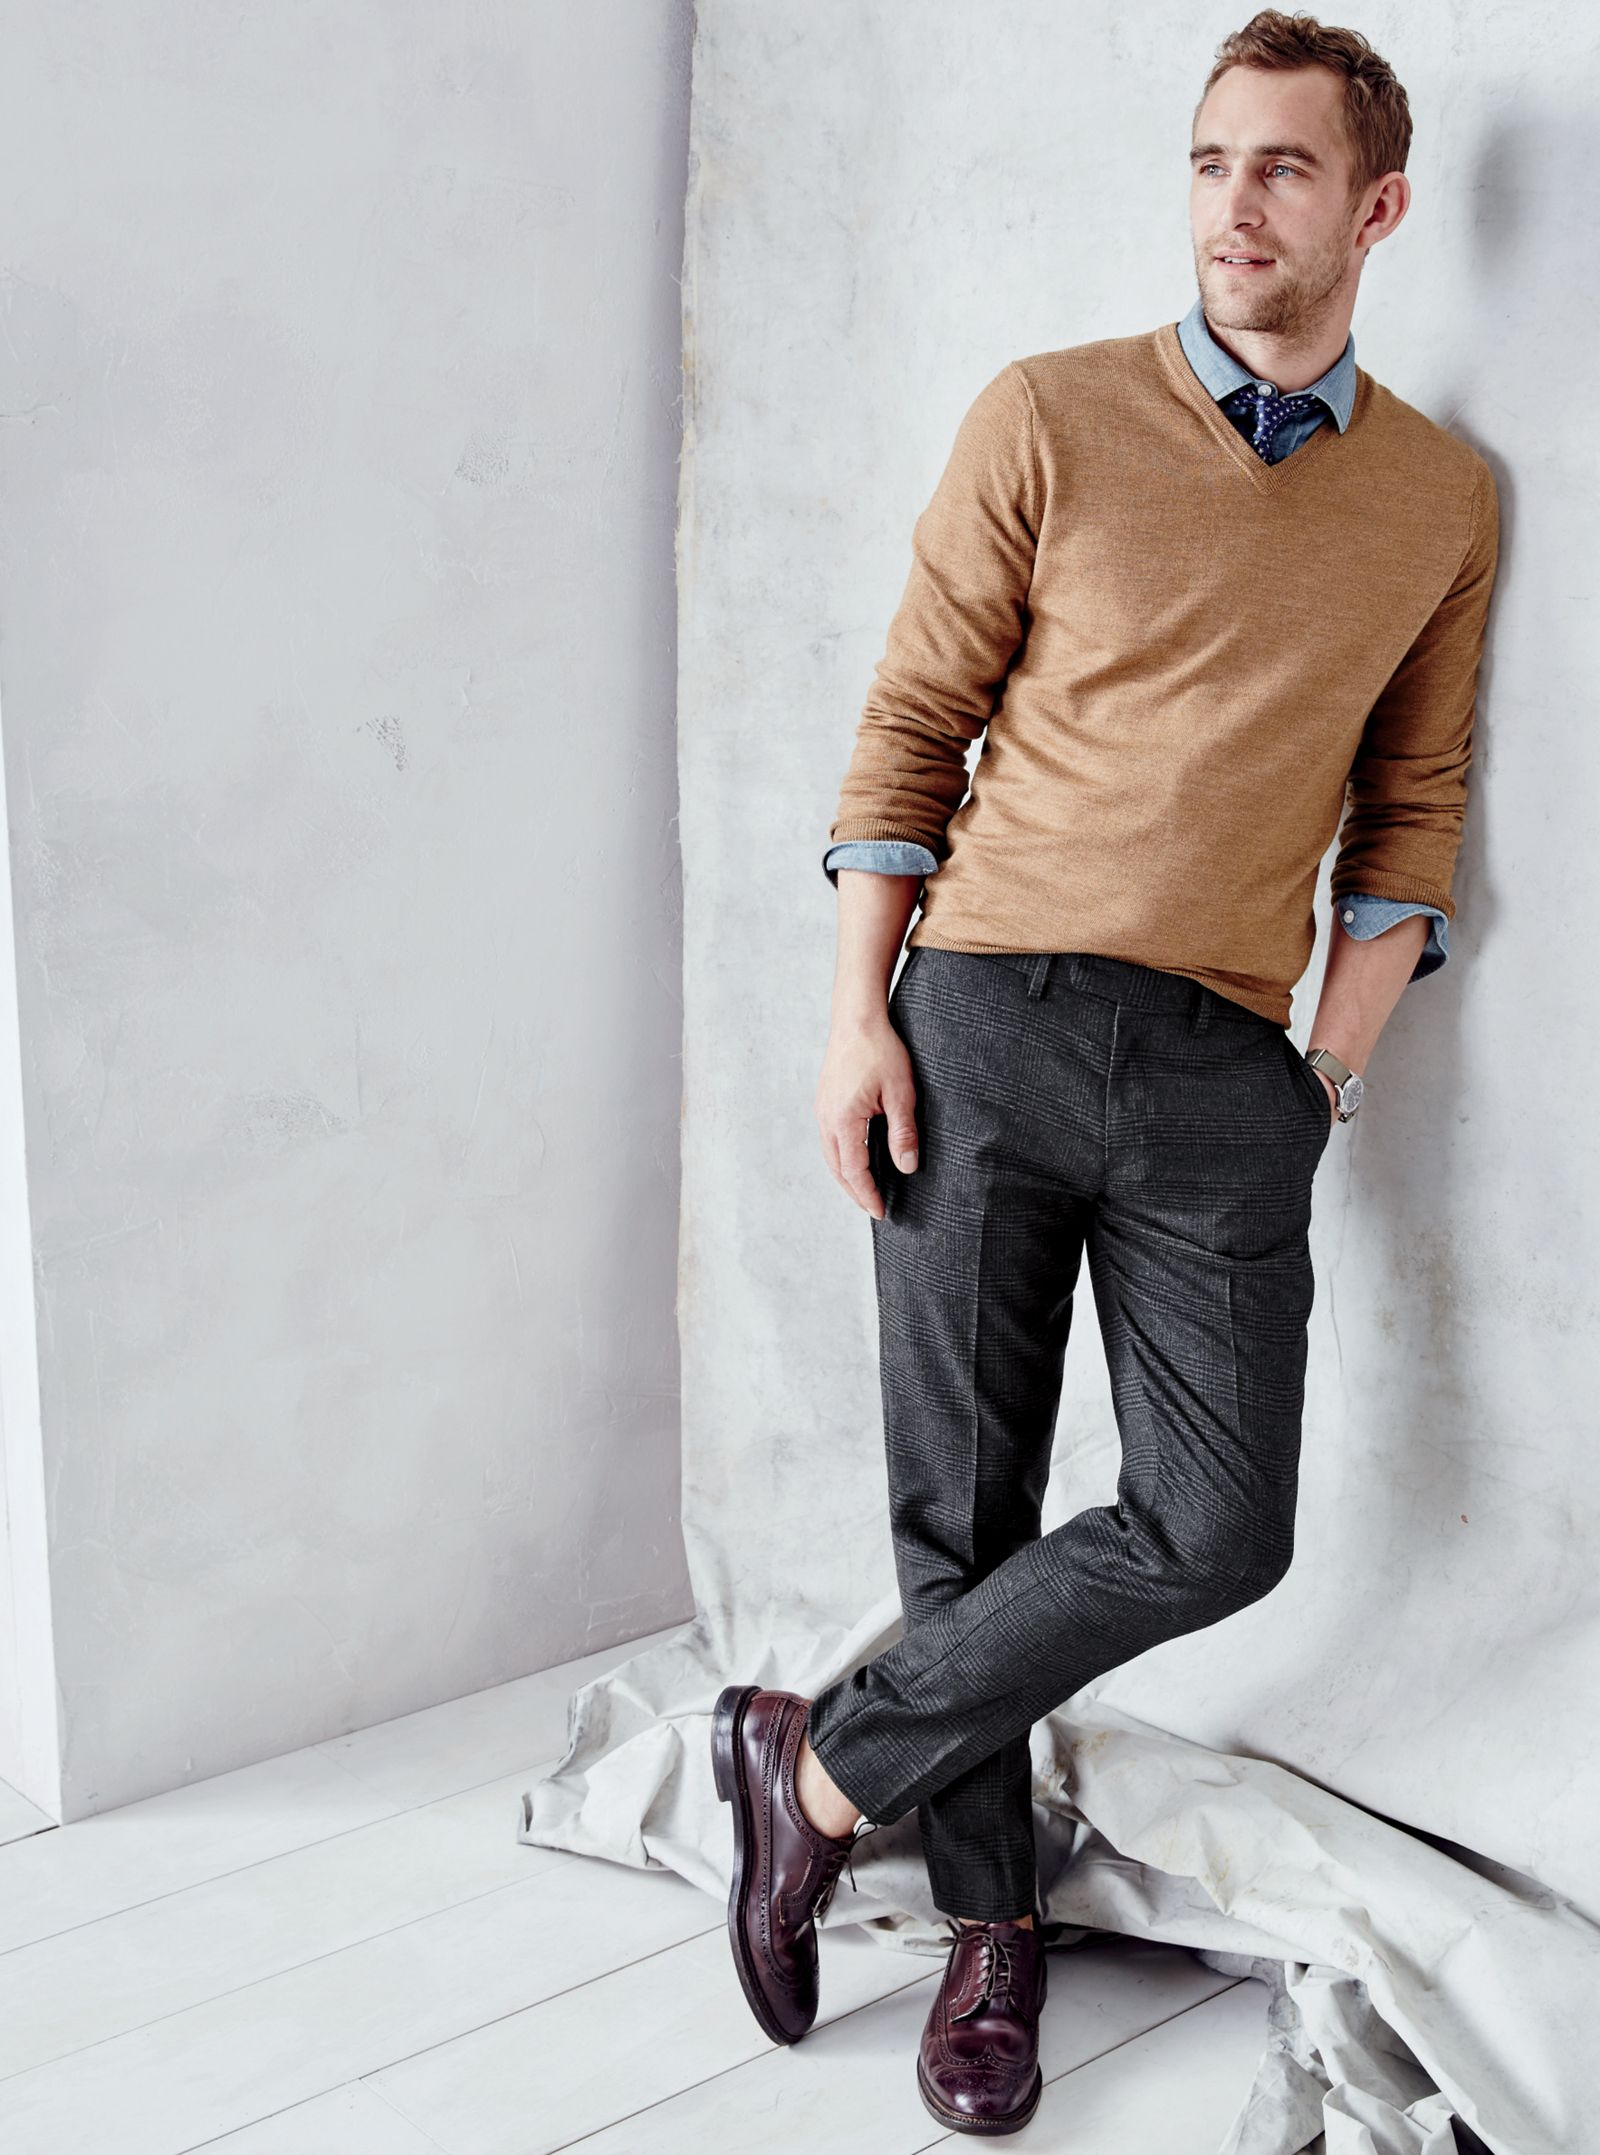 J.Crew men's V-neck sweater, slim glen plaid Bowery pant and Alden